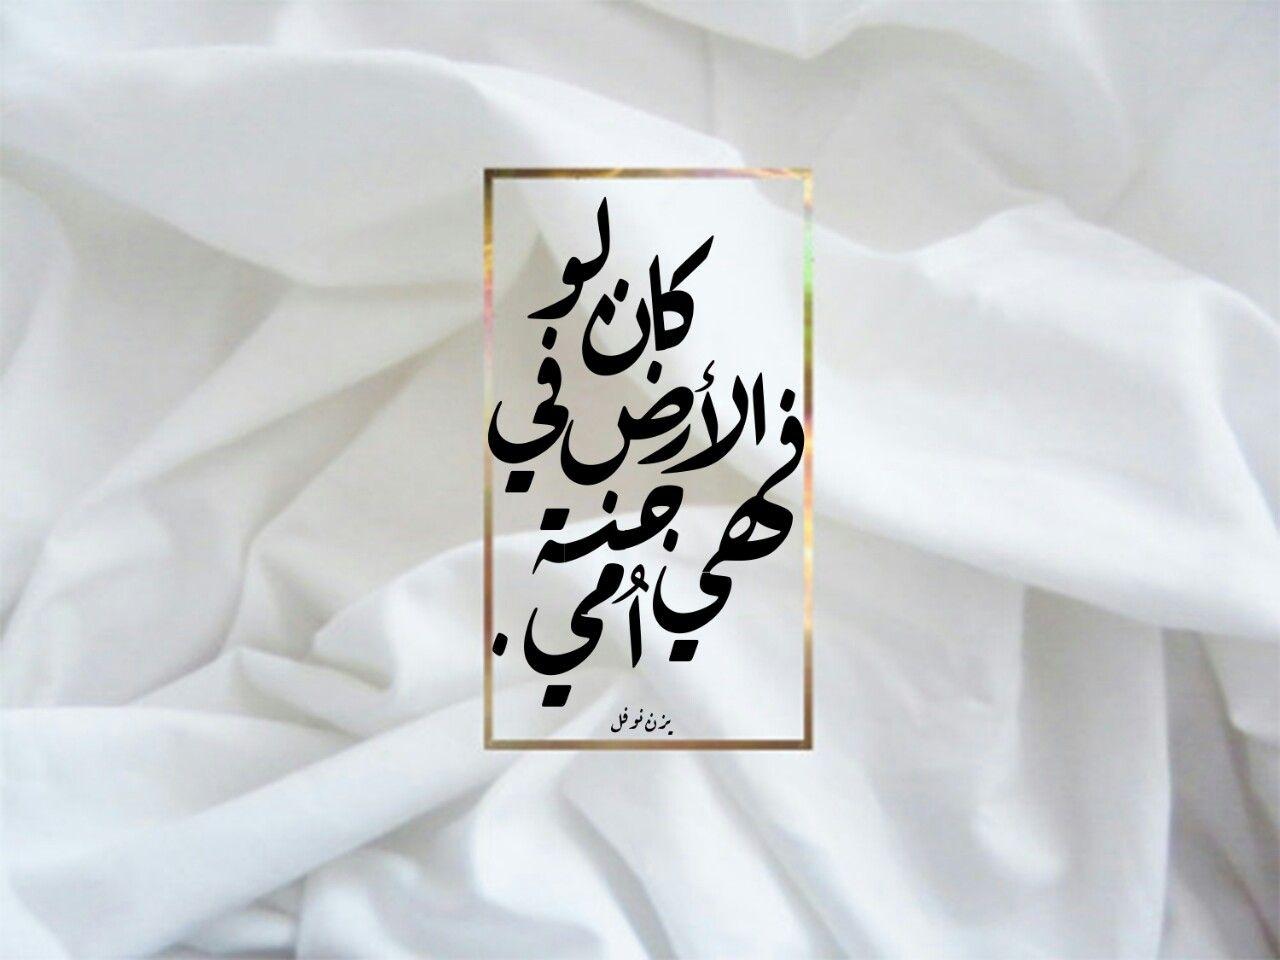 Yazannofal Yazan Nofal يزن نوفل Arabic Quotes Arabic Quotes Language Arabic Language Calligraphy Arabic Call Arabic Love Quotes Words Arabic Quotes